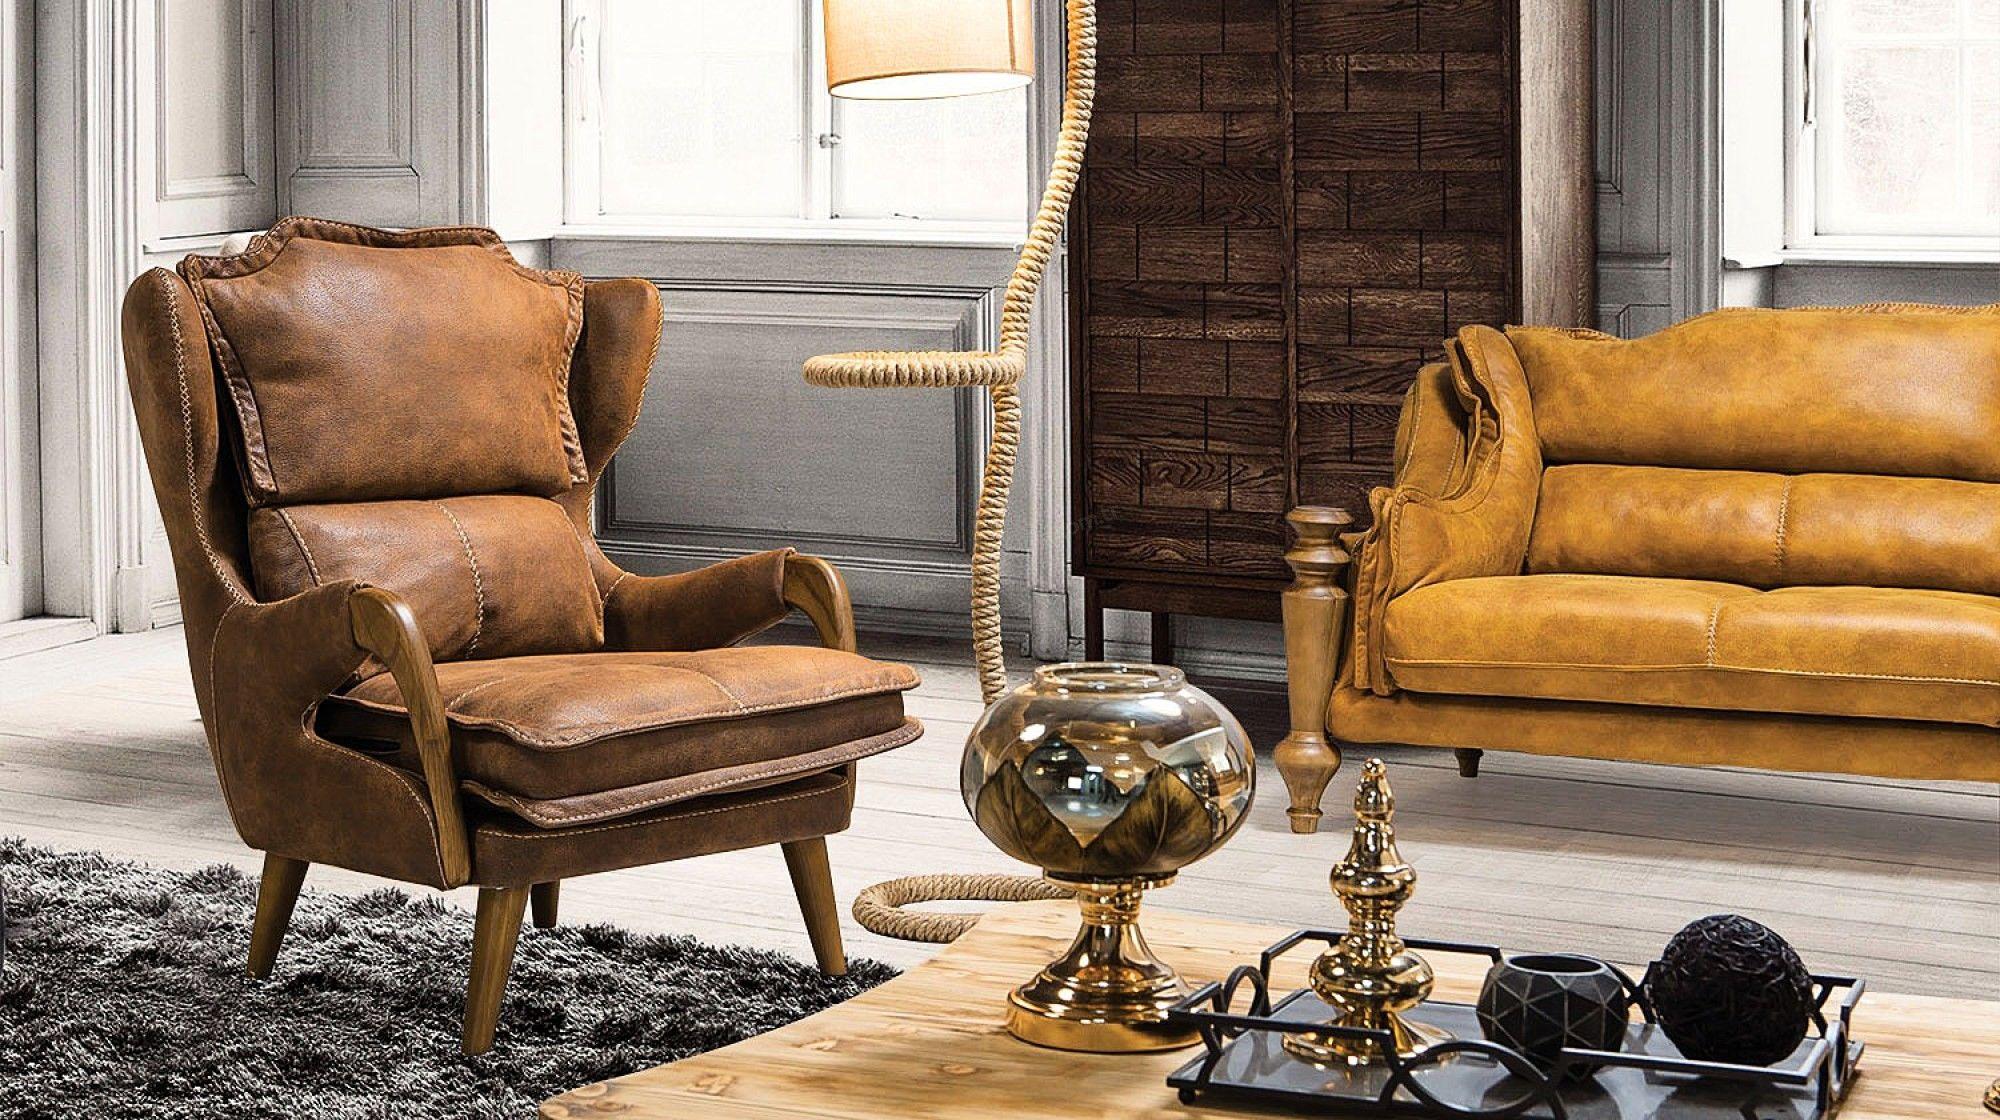 Pin By Gustavo Baamonde On Kultuk Takimlari Living Room Turquoise Furniture Home Decor